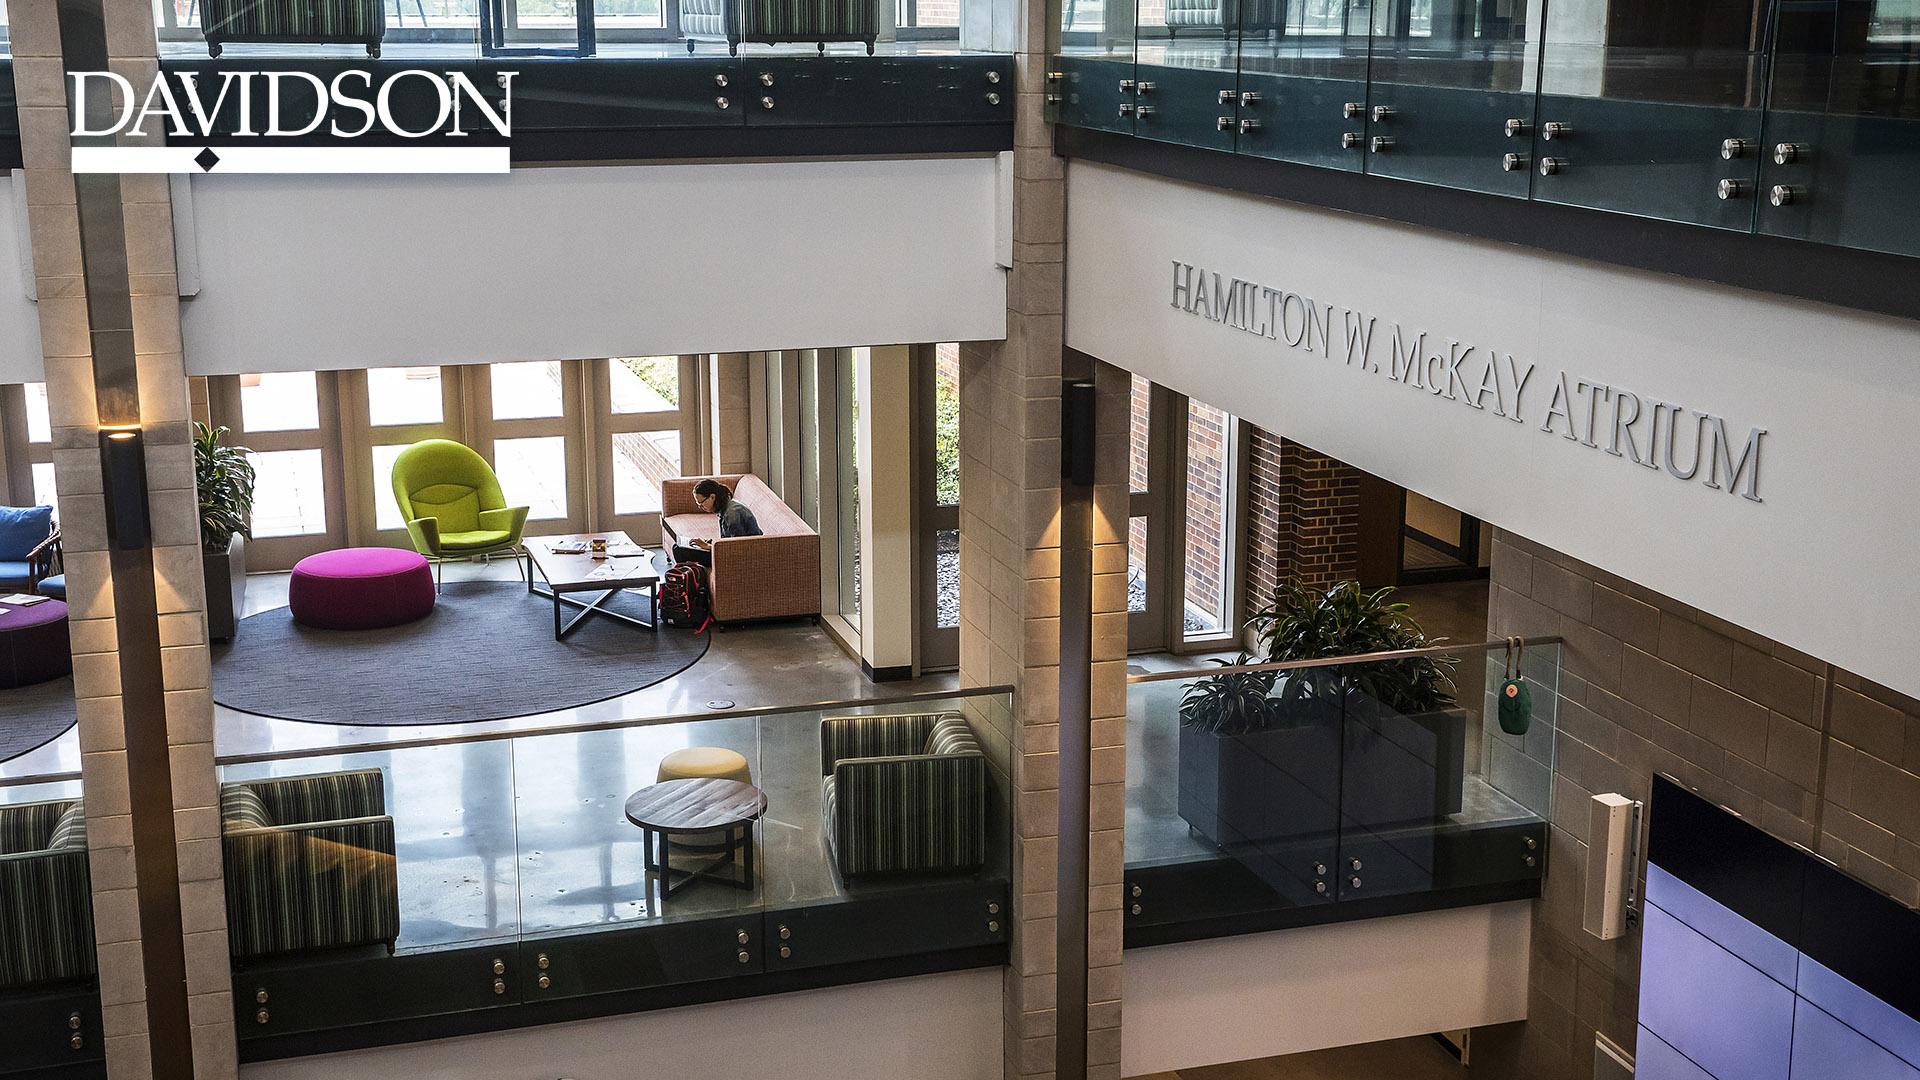 Wall Atrium with Davidson Bar and Diamond Logo